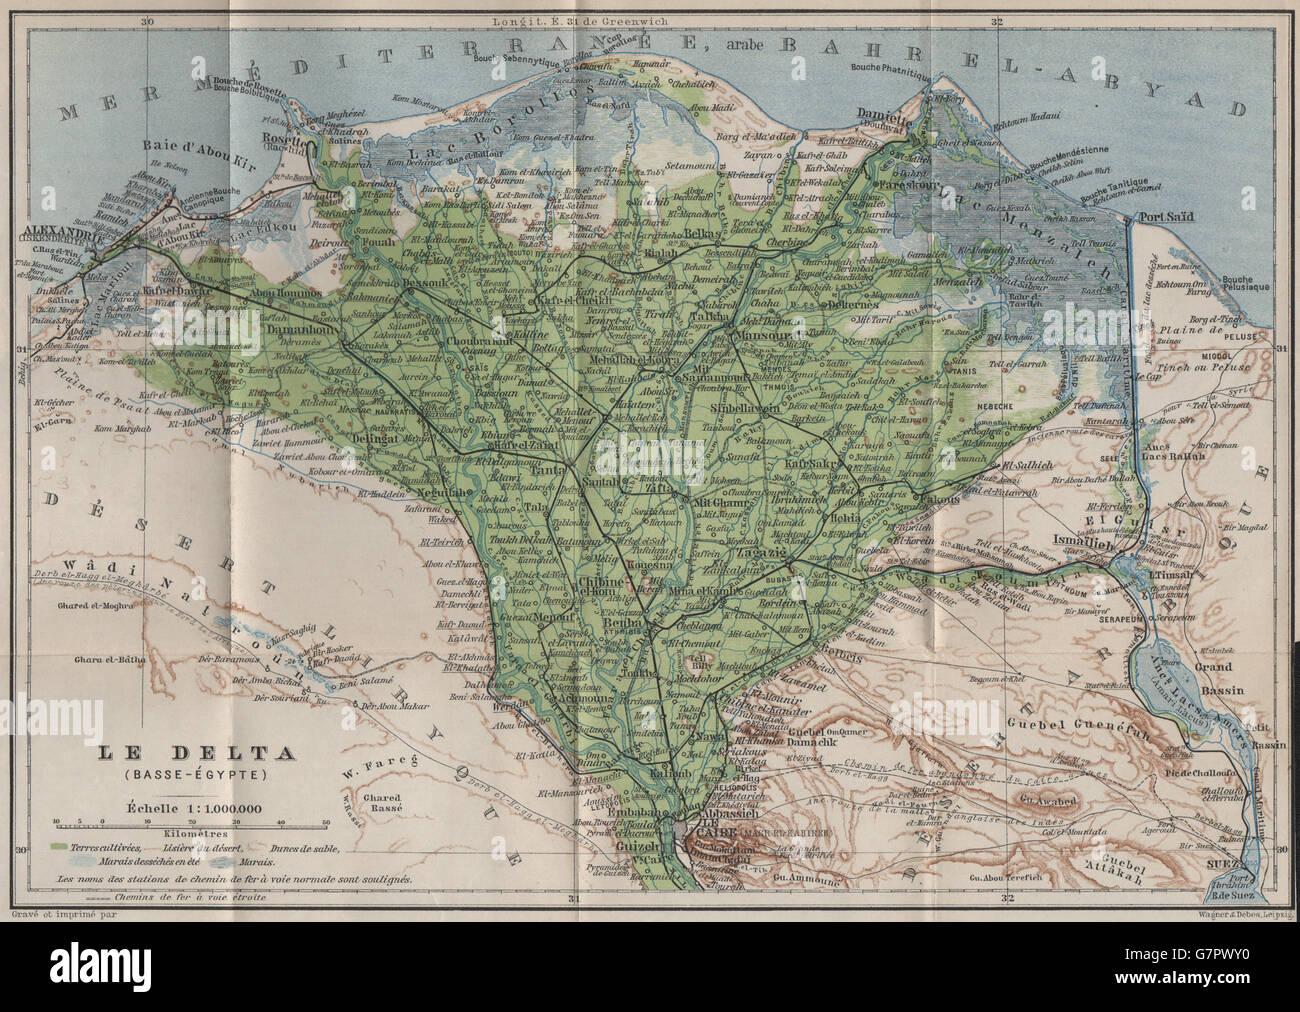 THE NILE DELTA. LOWER EGYPT. BASSE-ÉGYPTE. BAEDEKER, 1914 antique map - Stock Image